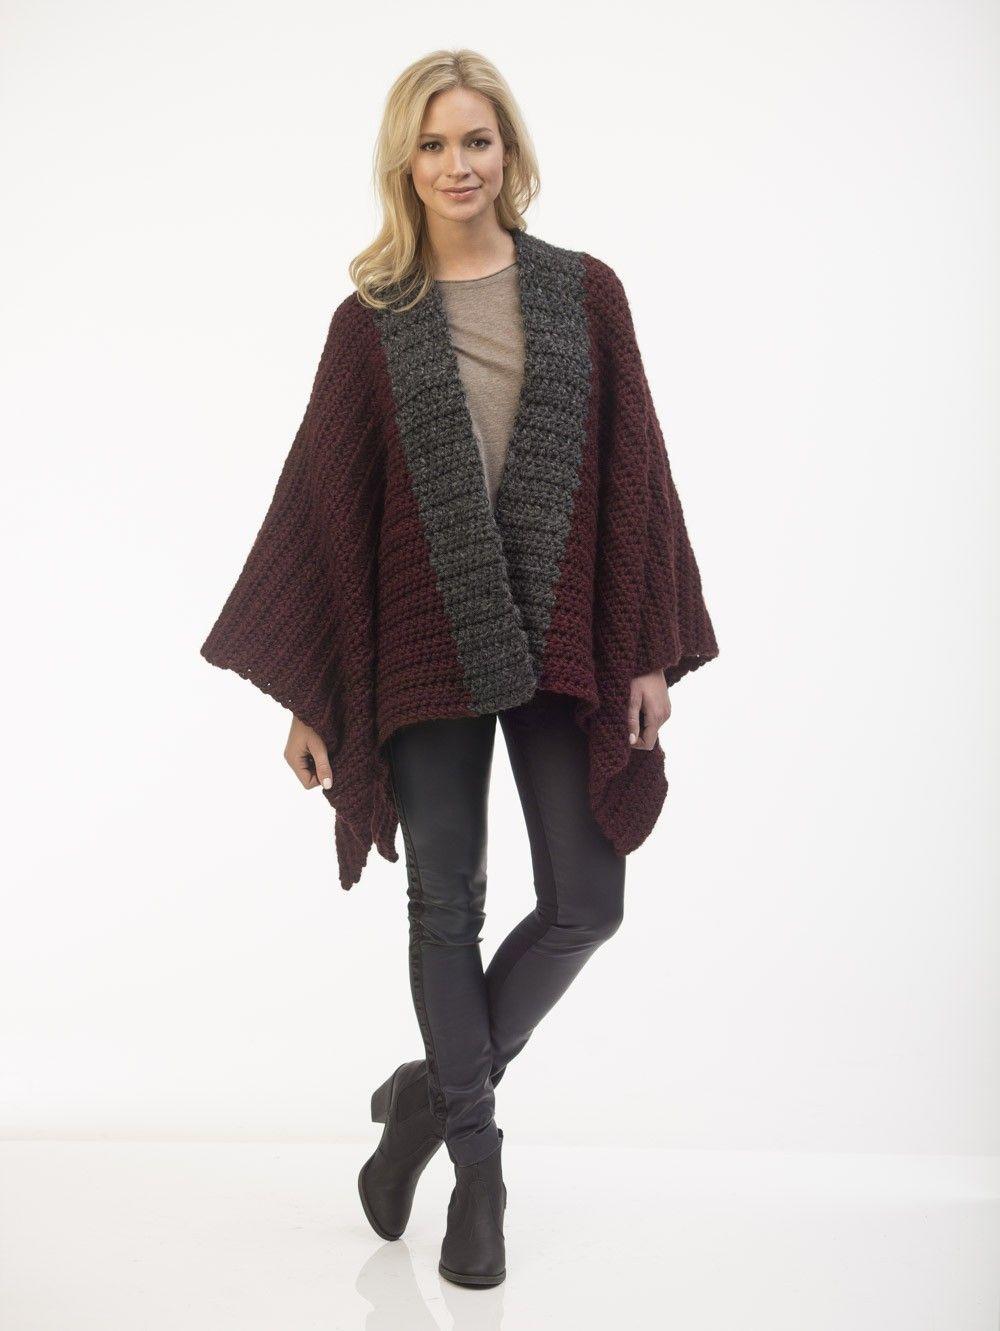 Carrington Poncho | crochet & knit clothing | Pinterest | Ponchos ...